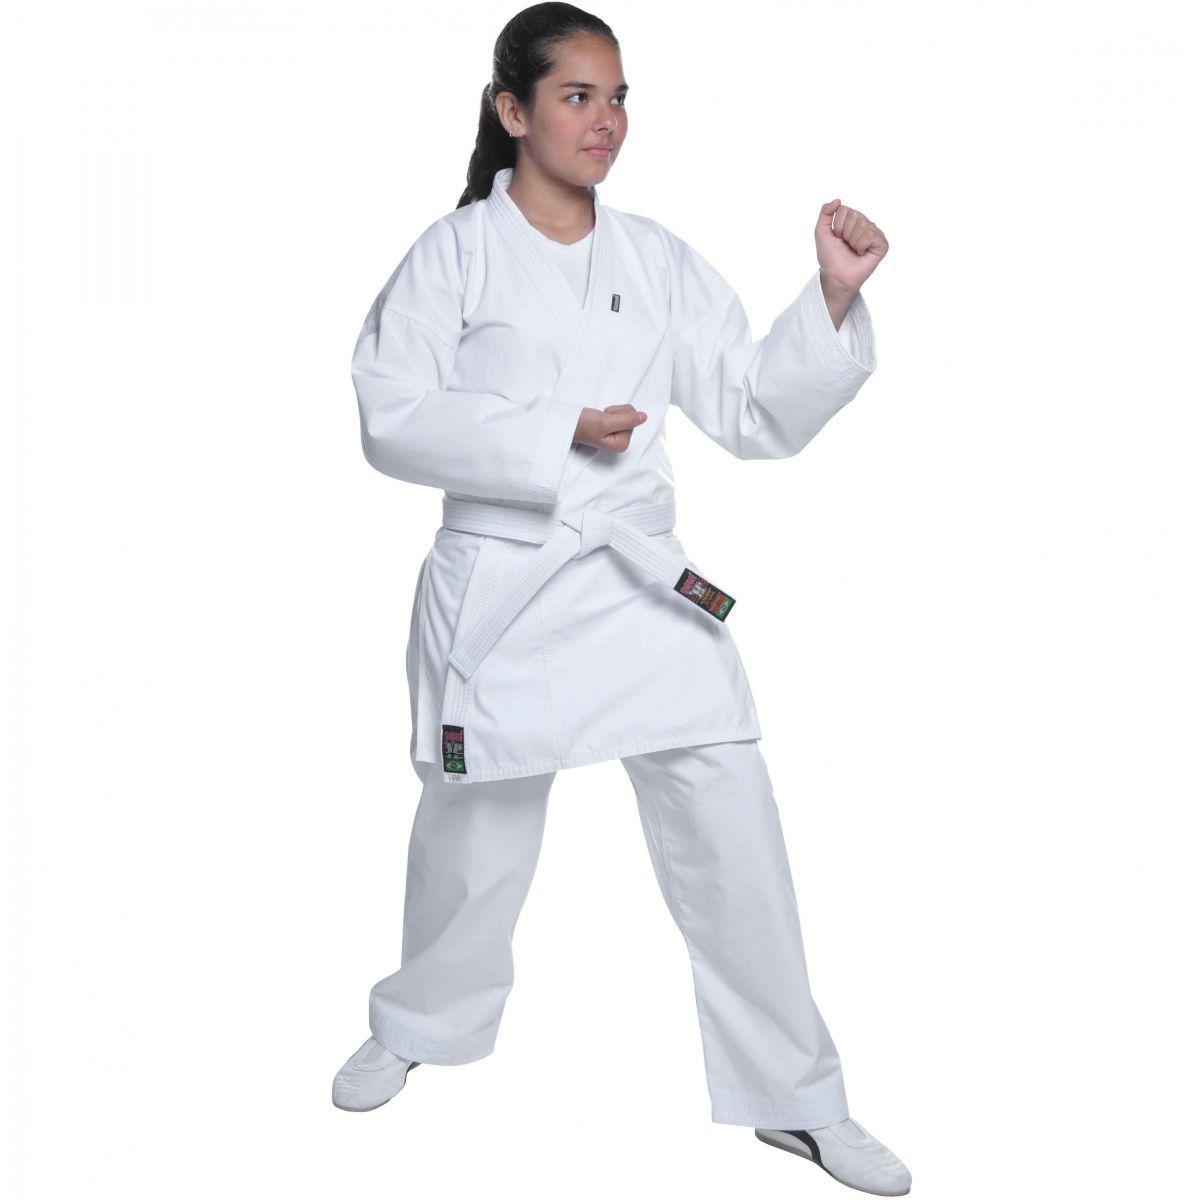 Kimono Karate - Microfibra - Branco - Adulto - Shiroi